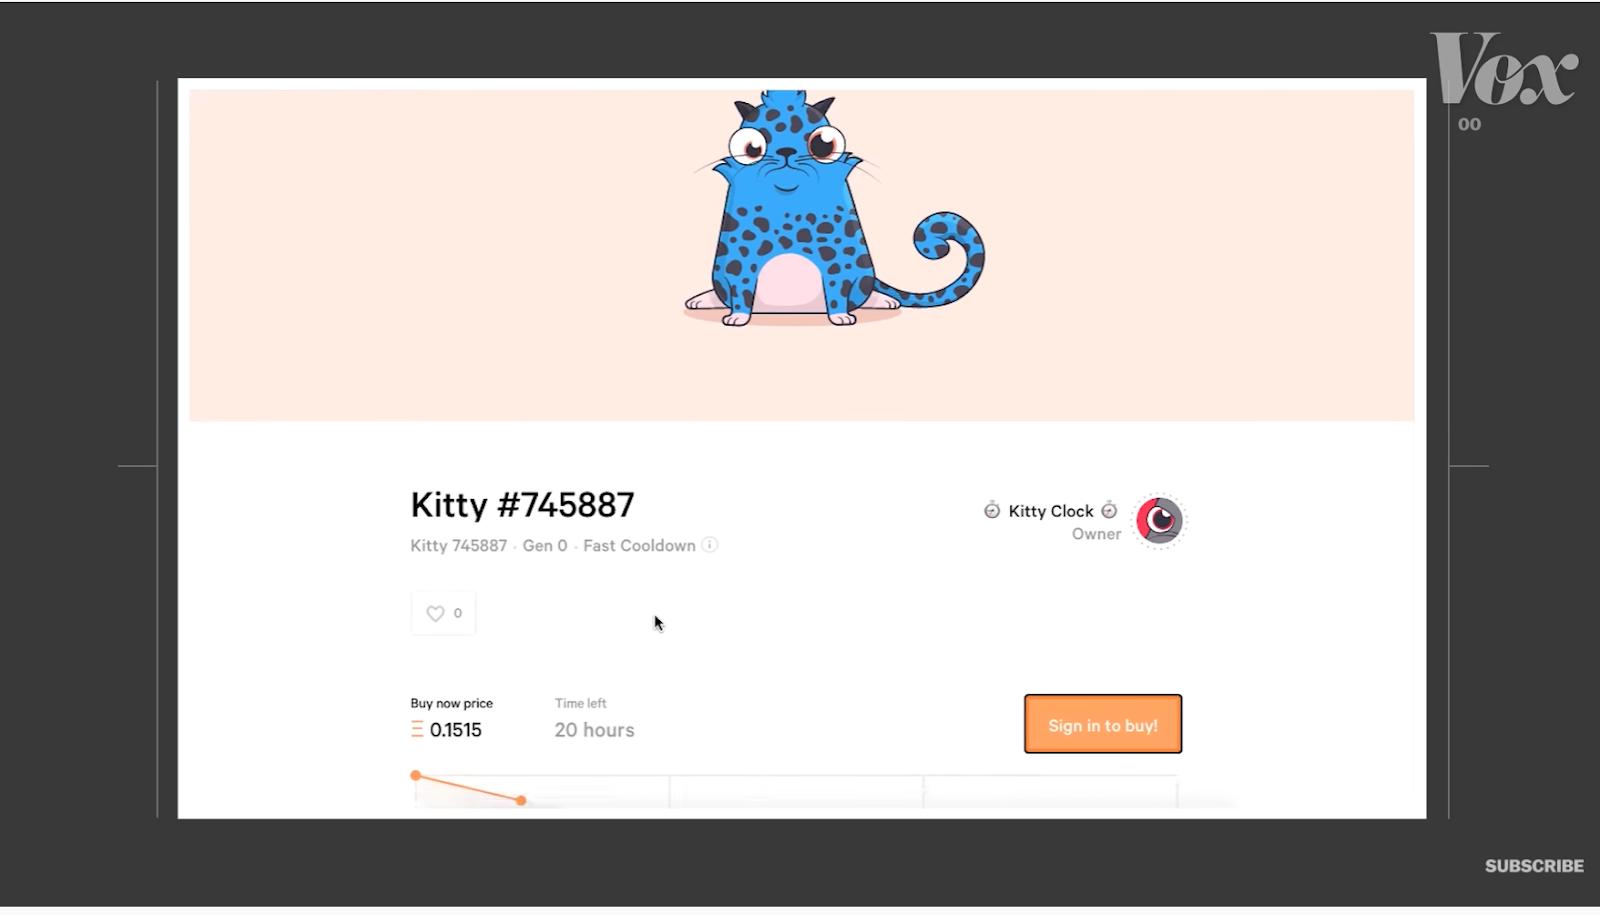 Image from CryptoKitties_NFT developing platform